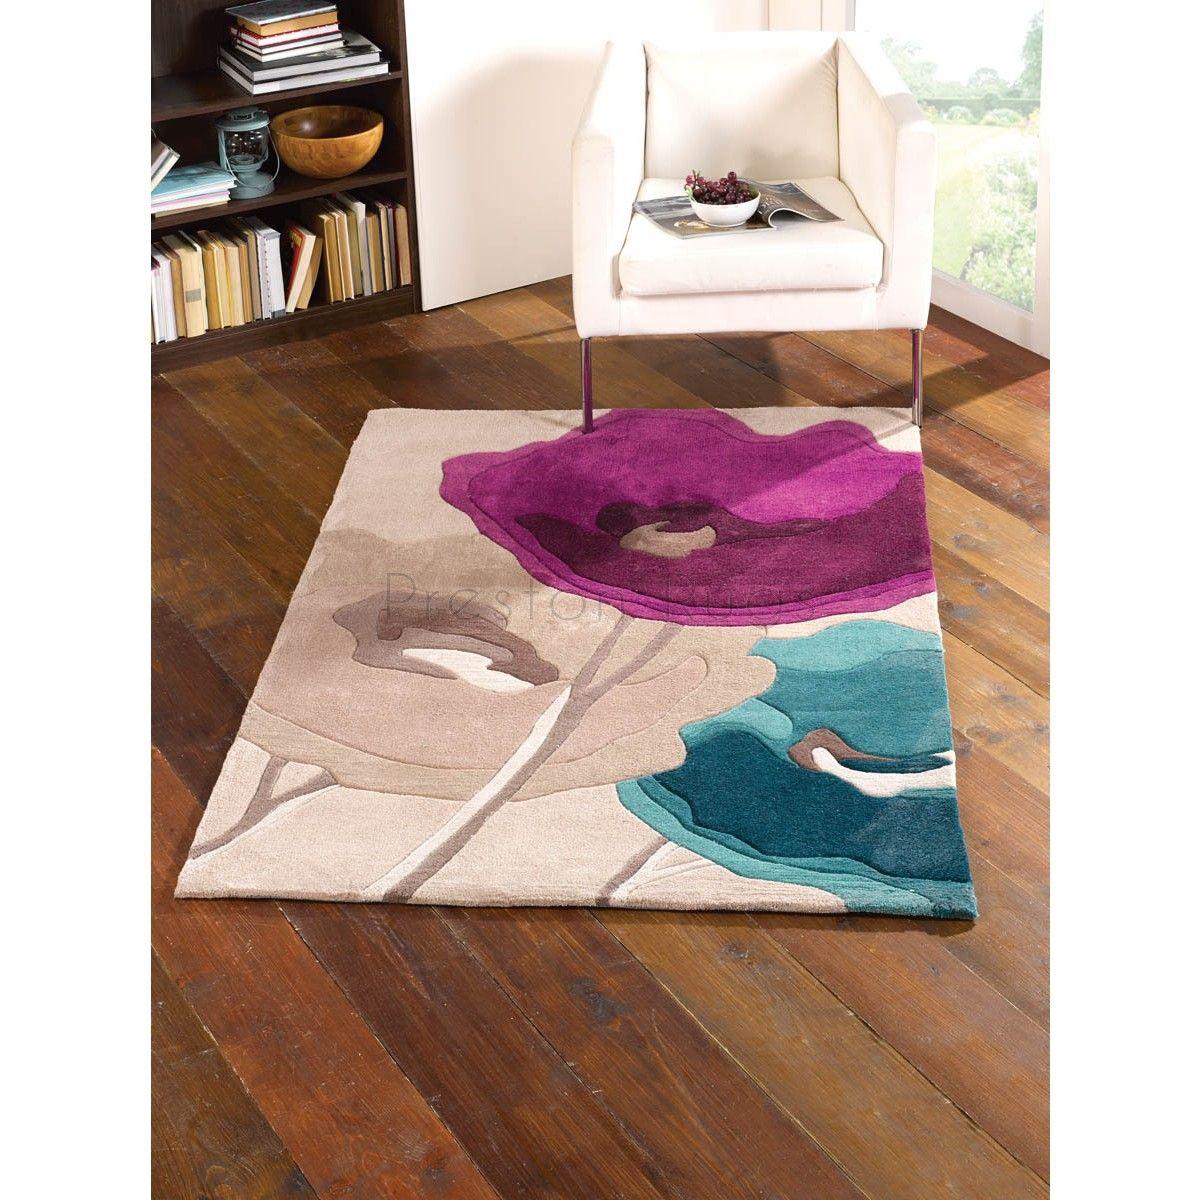 Infinite mod art poppy teal purple flower rug bedroom pinterest infinite mod art poppy teal purple flower rug mightylinksfo